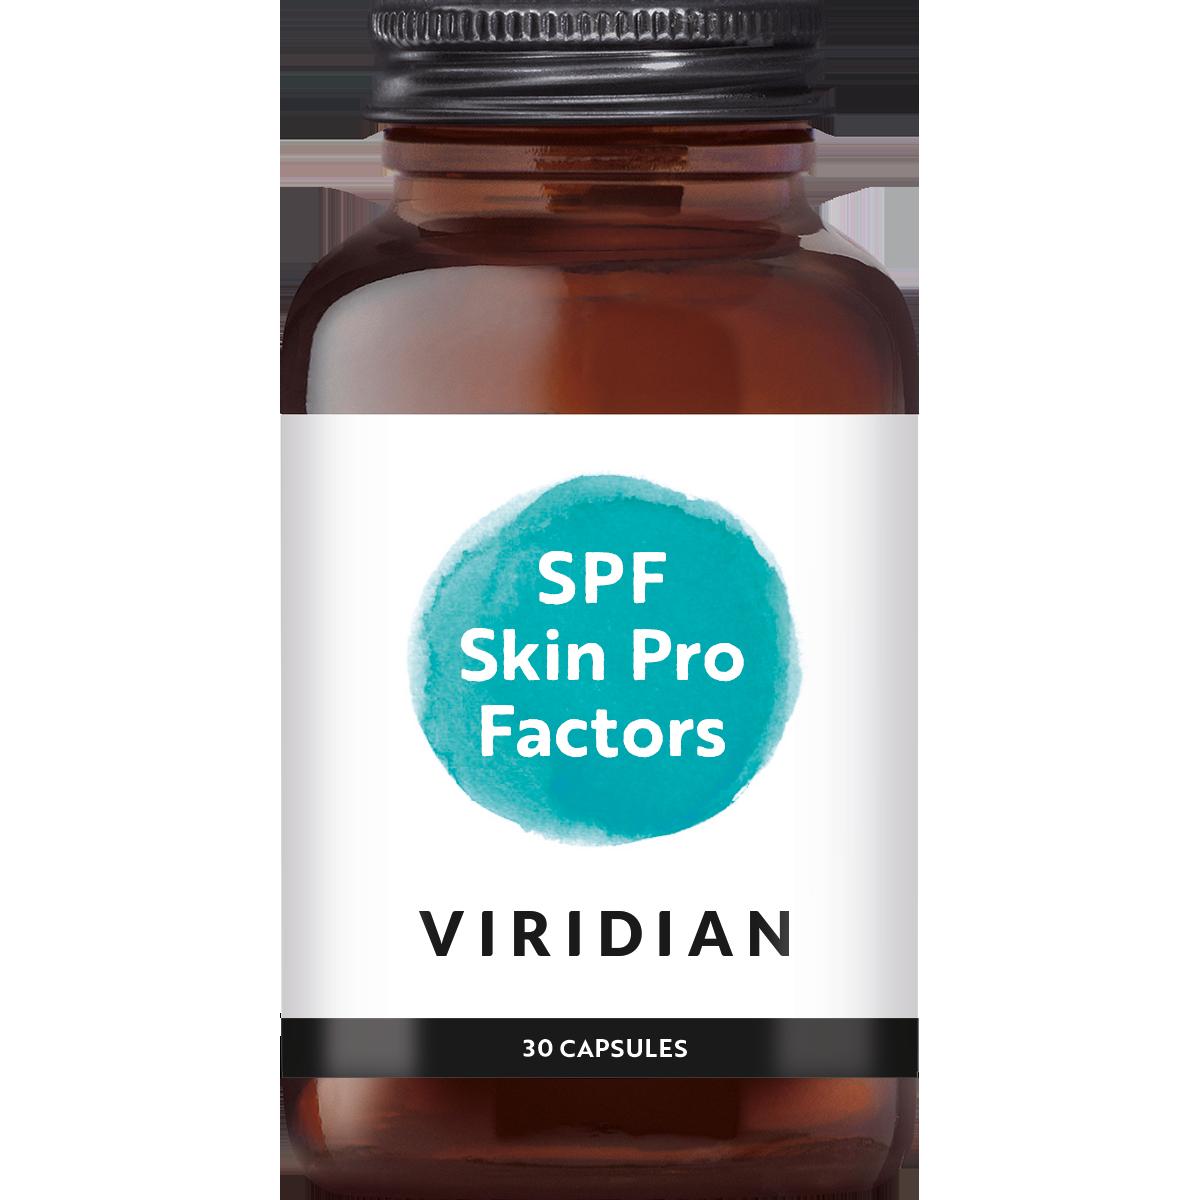 S.P.F. Skin Pro-Factors